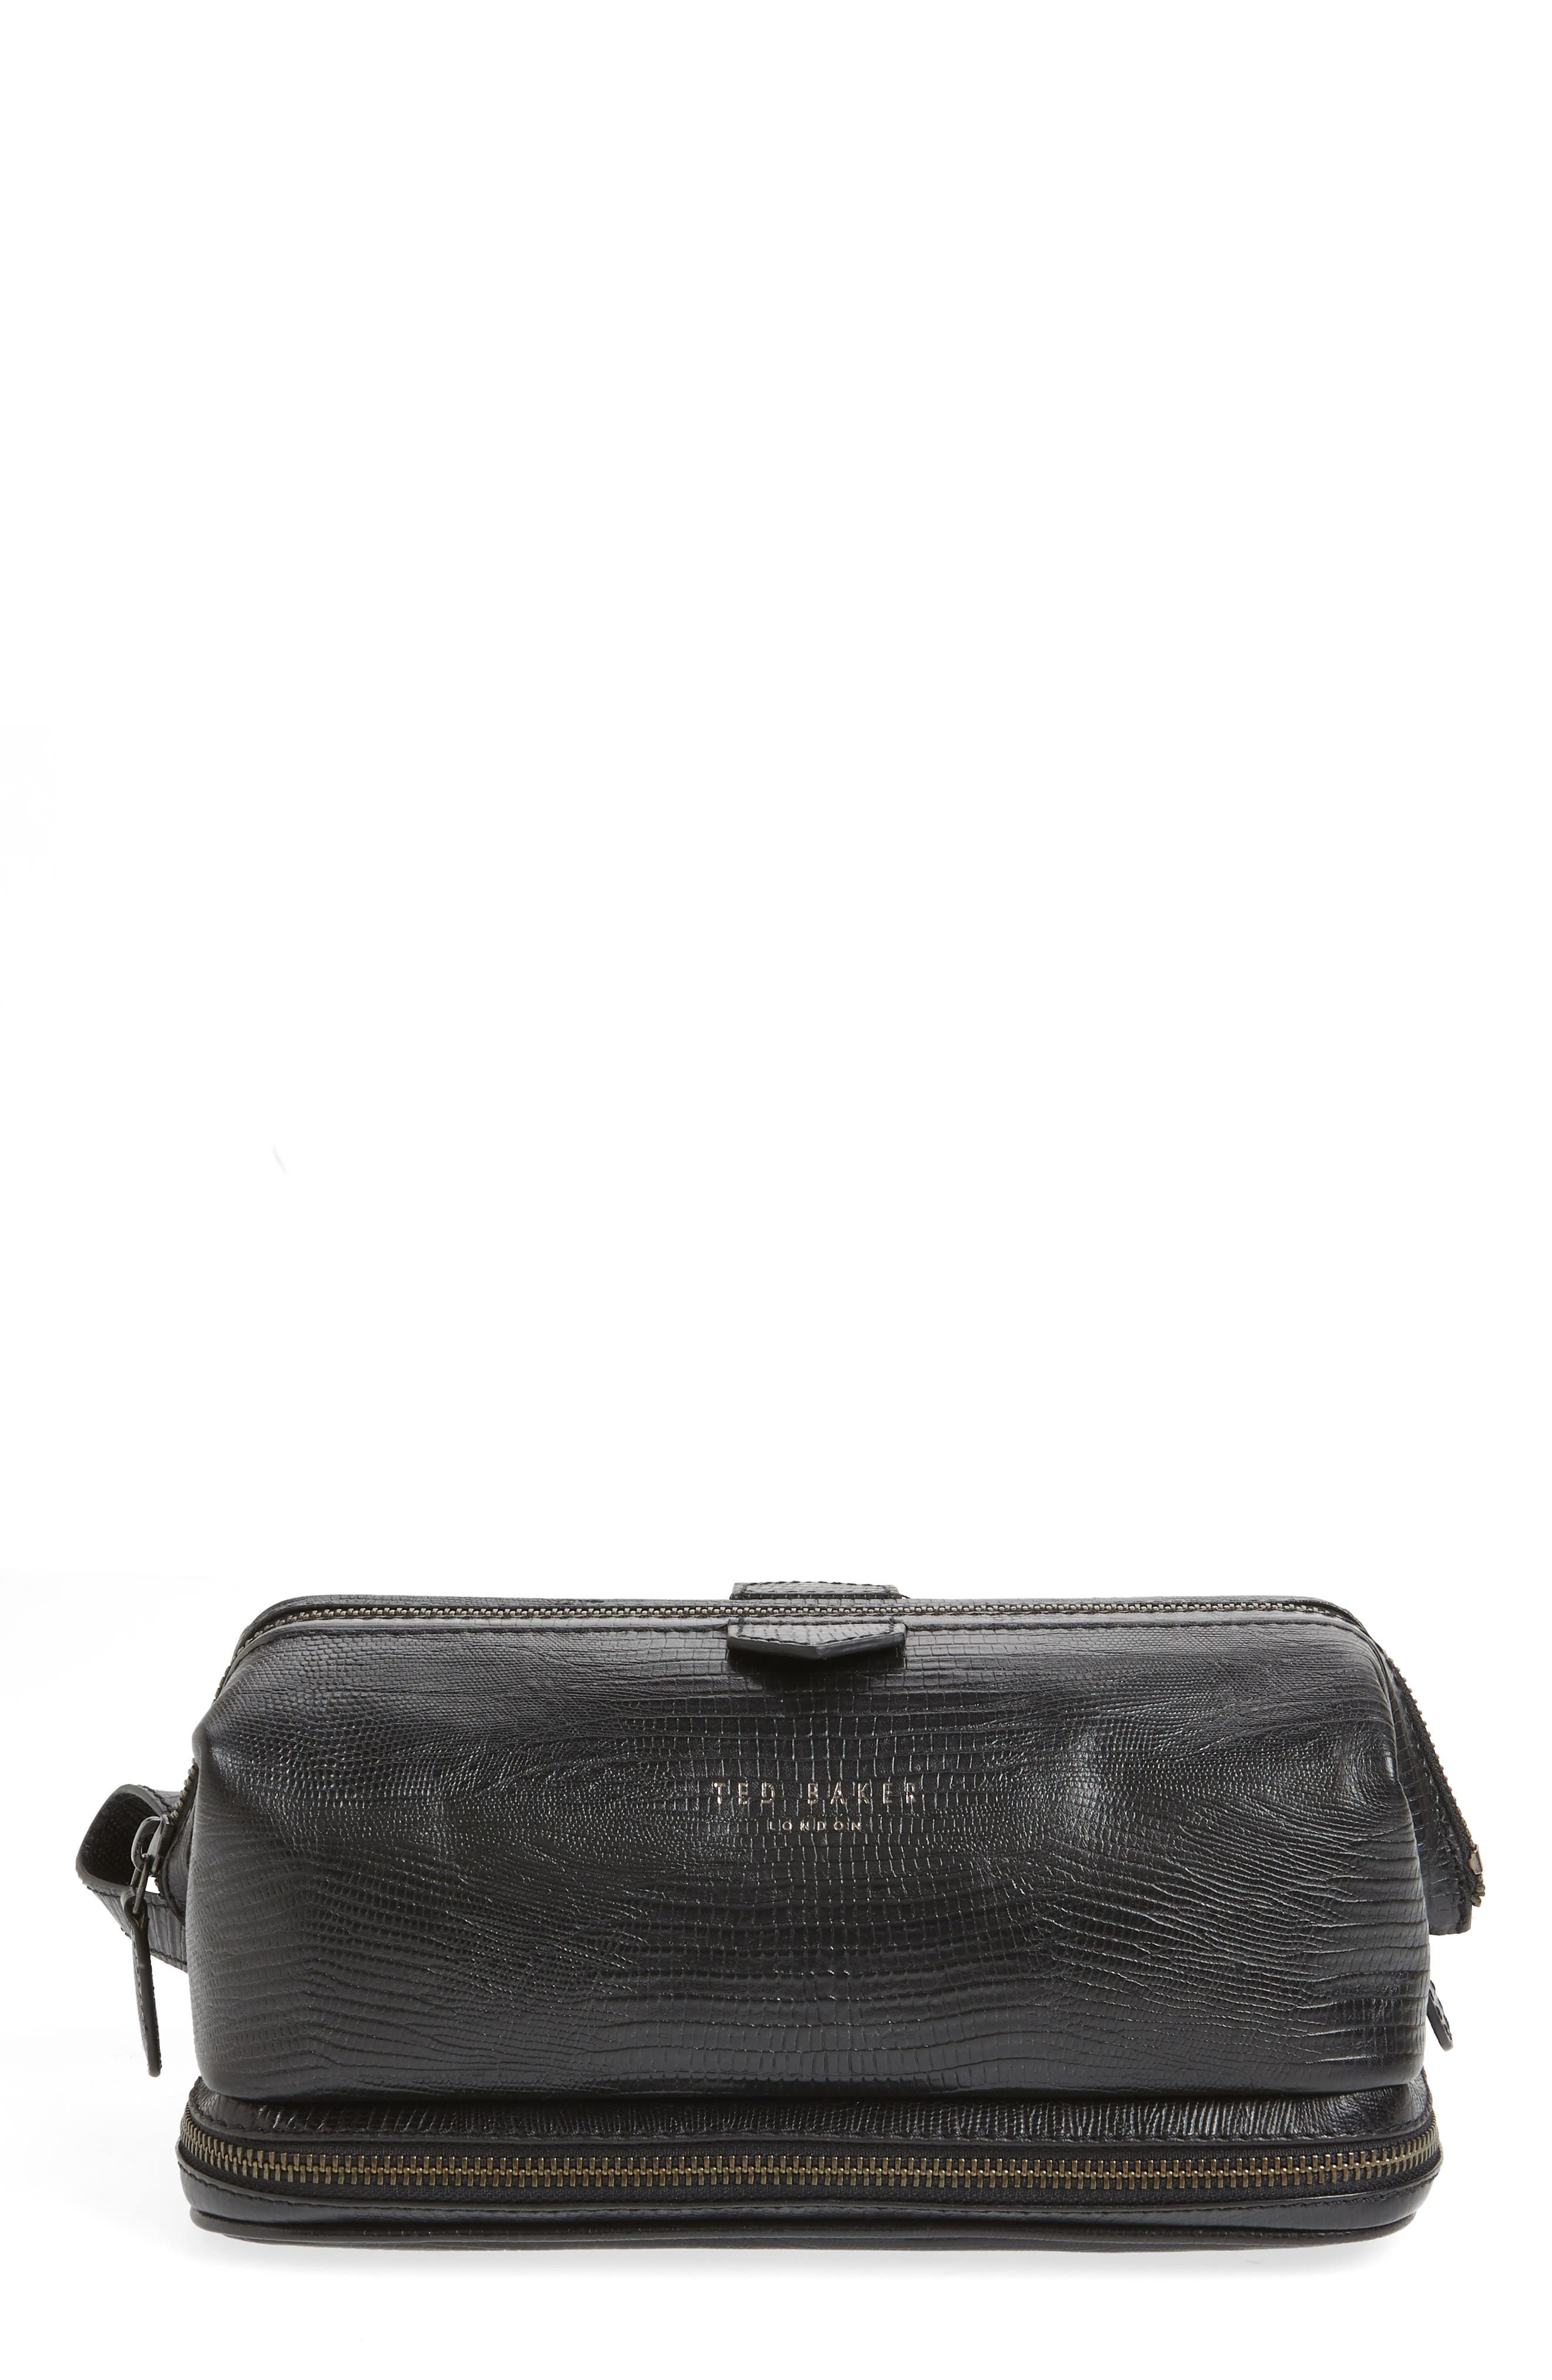 Chocks Leather Dopp Kit,                         Main,                         color, BLACK